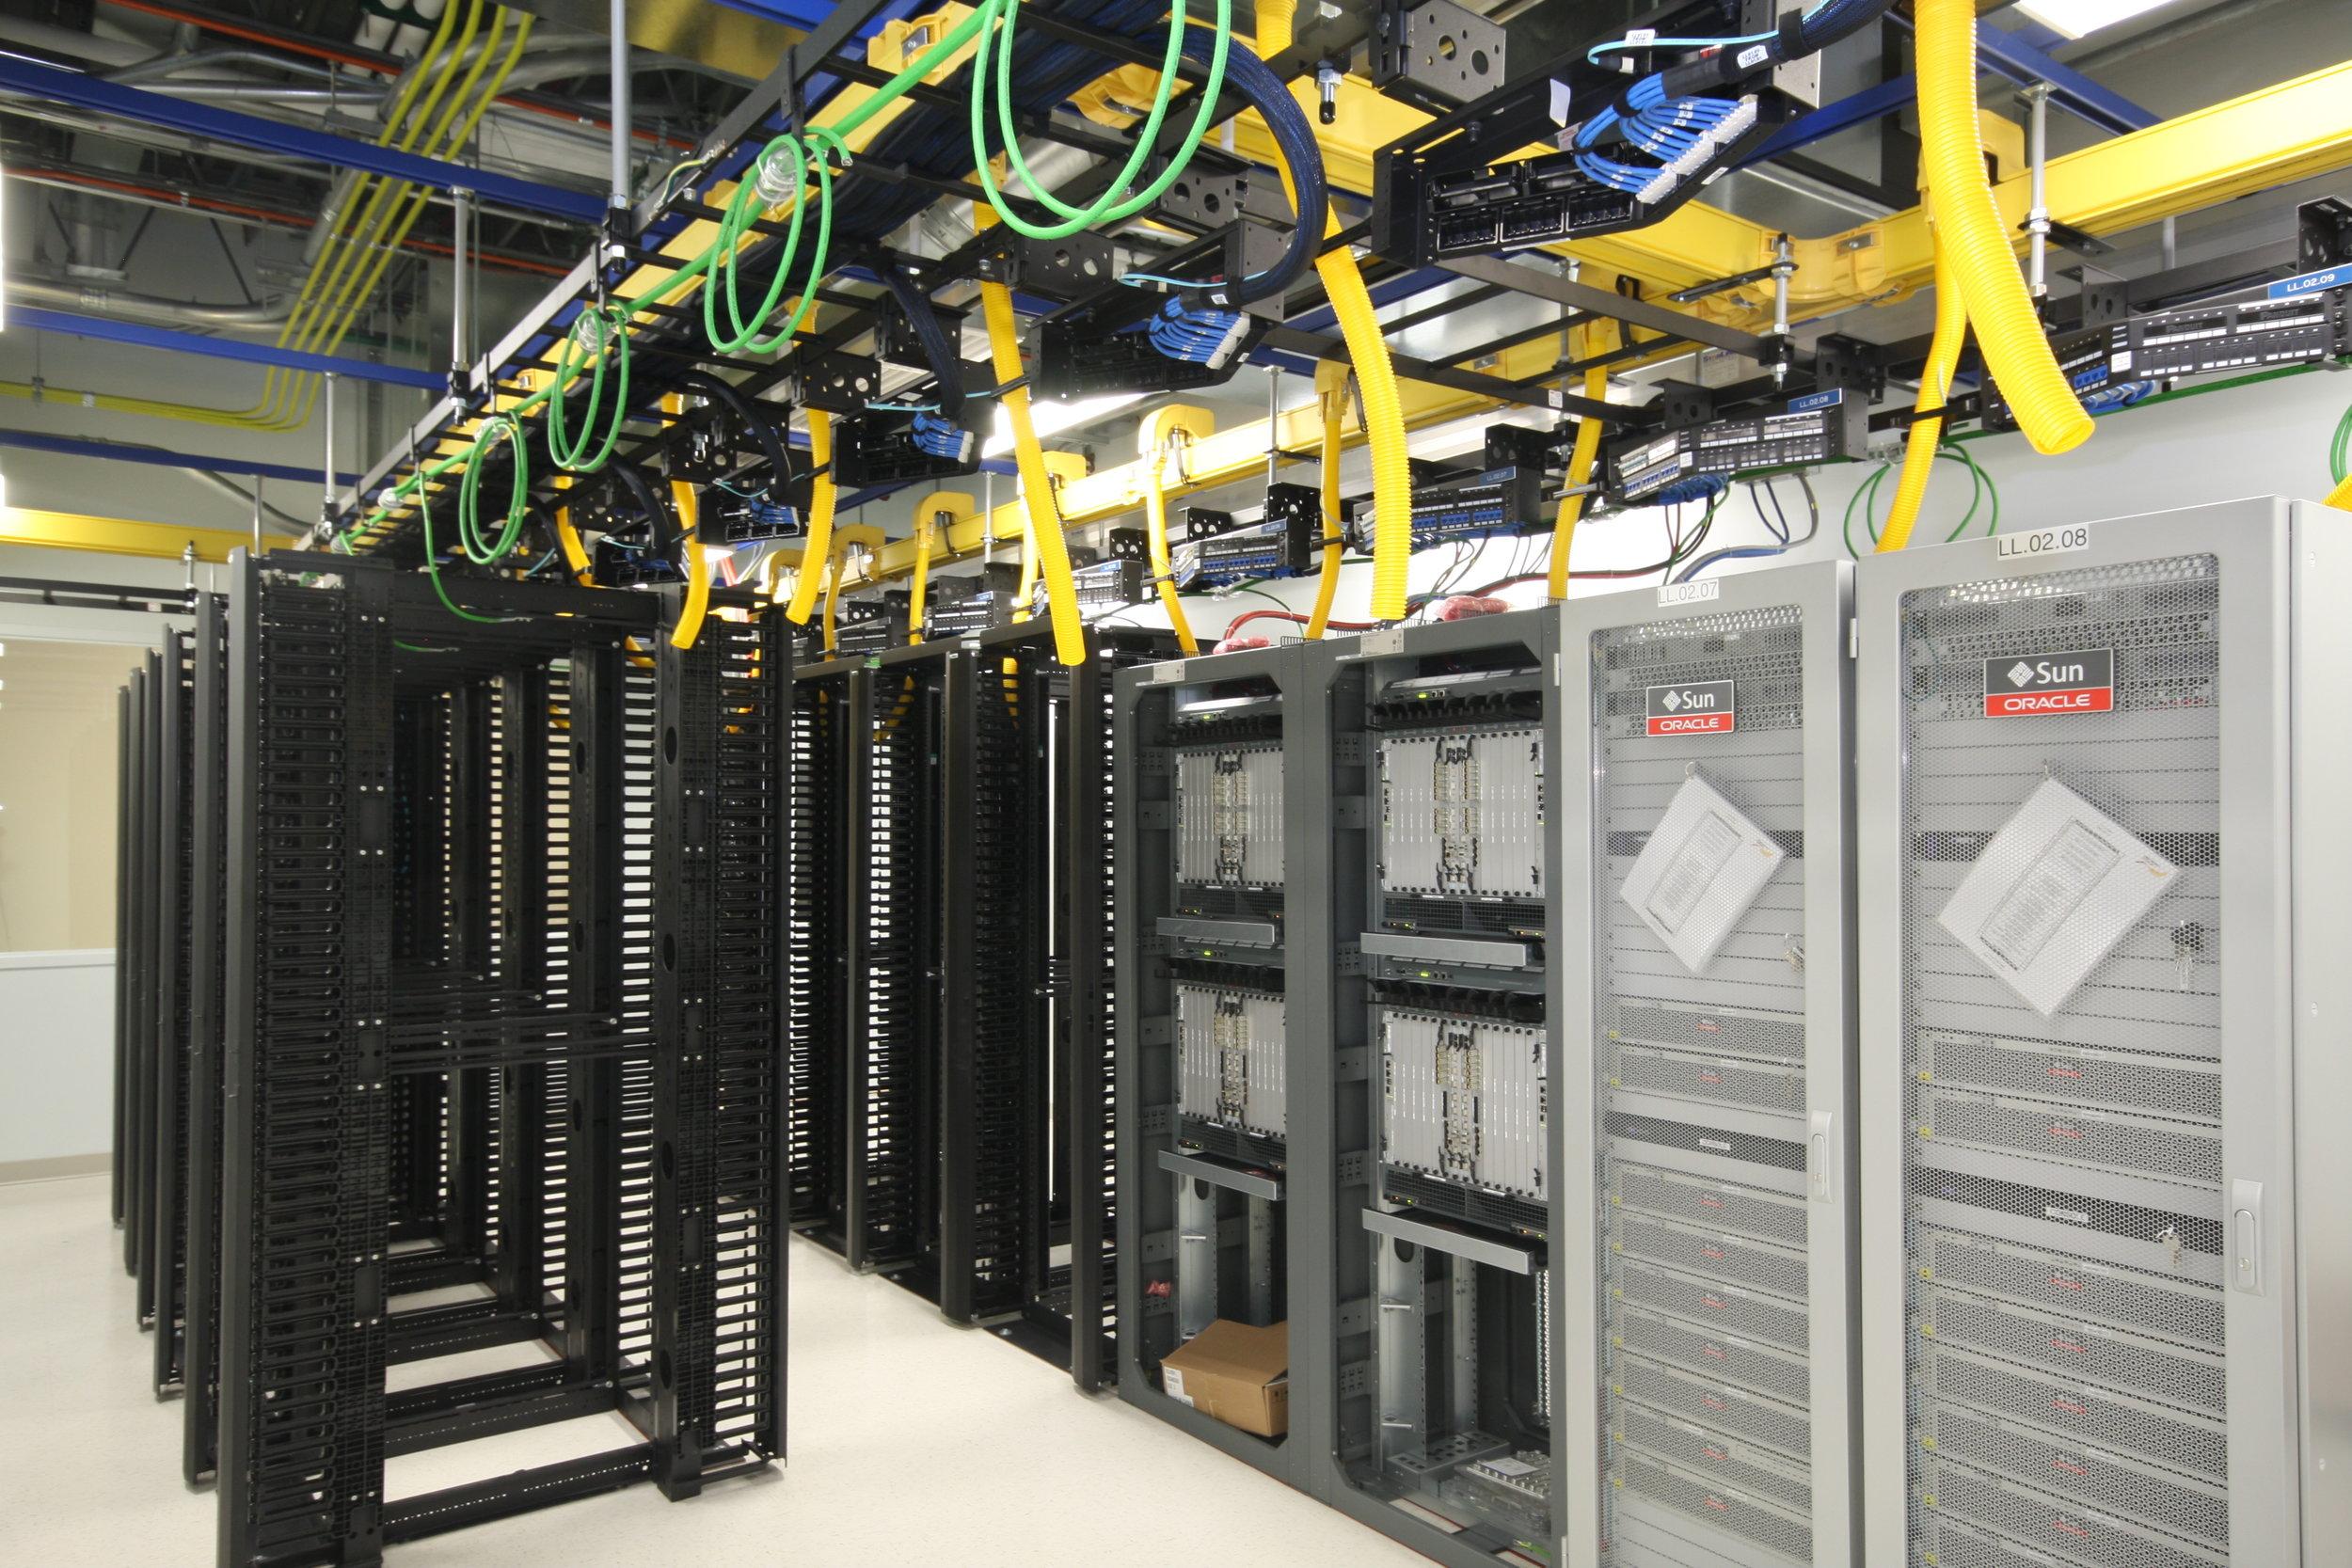 Chicago Data Center - CH05.1.JPG